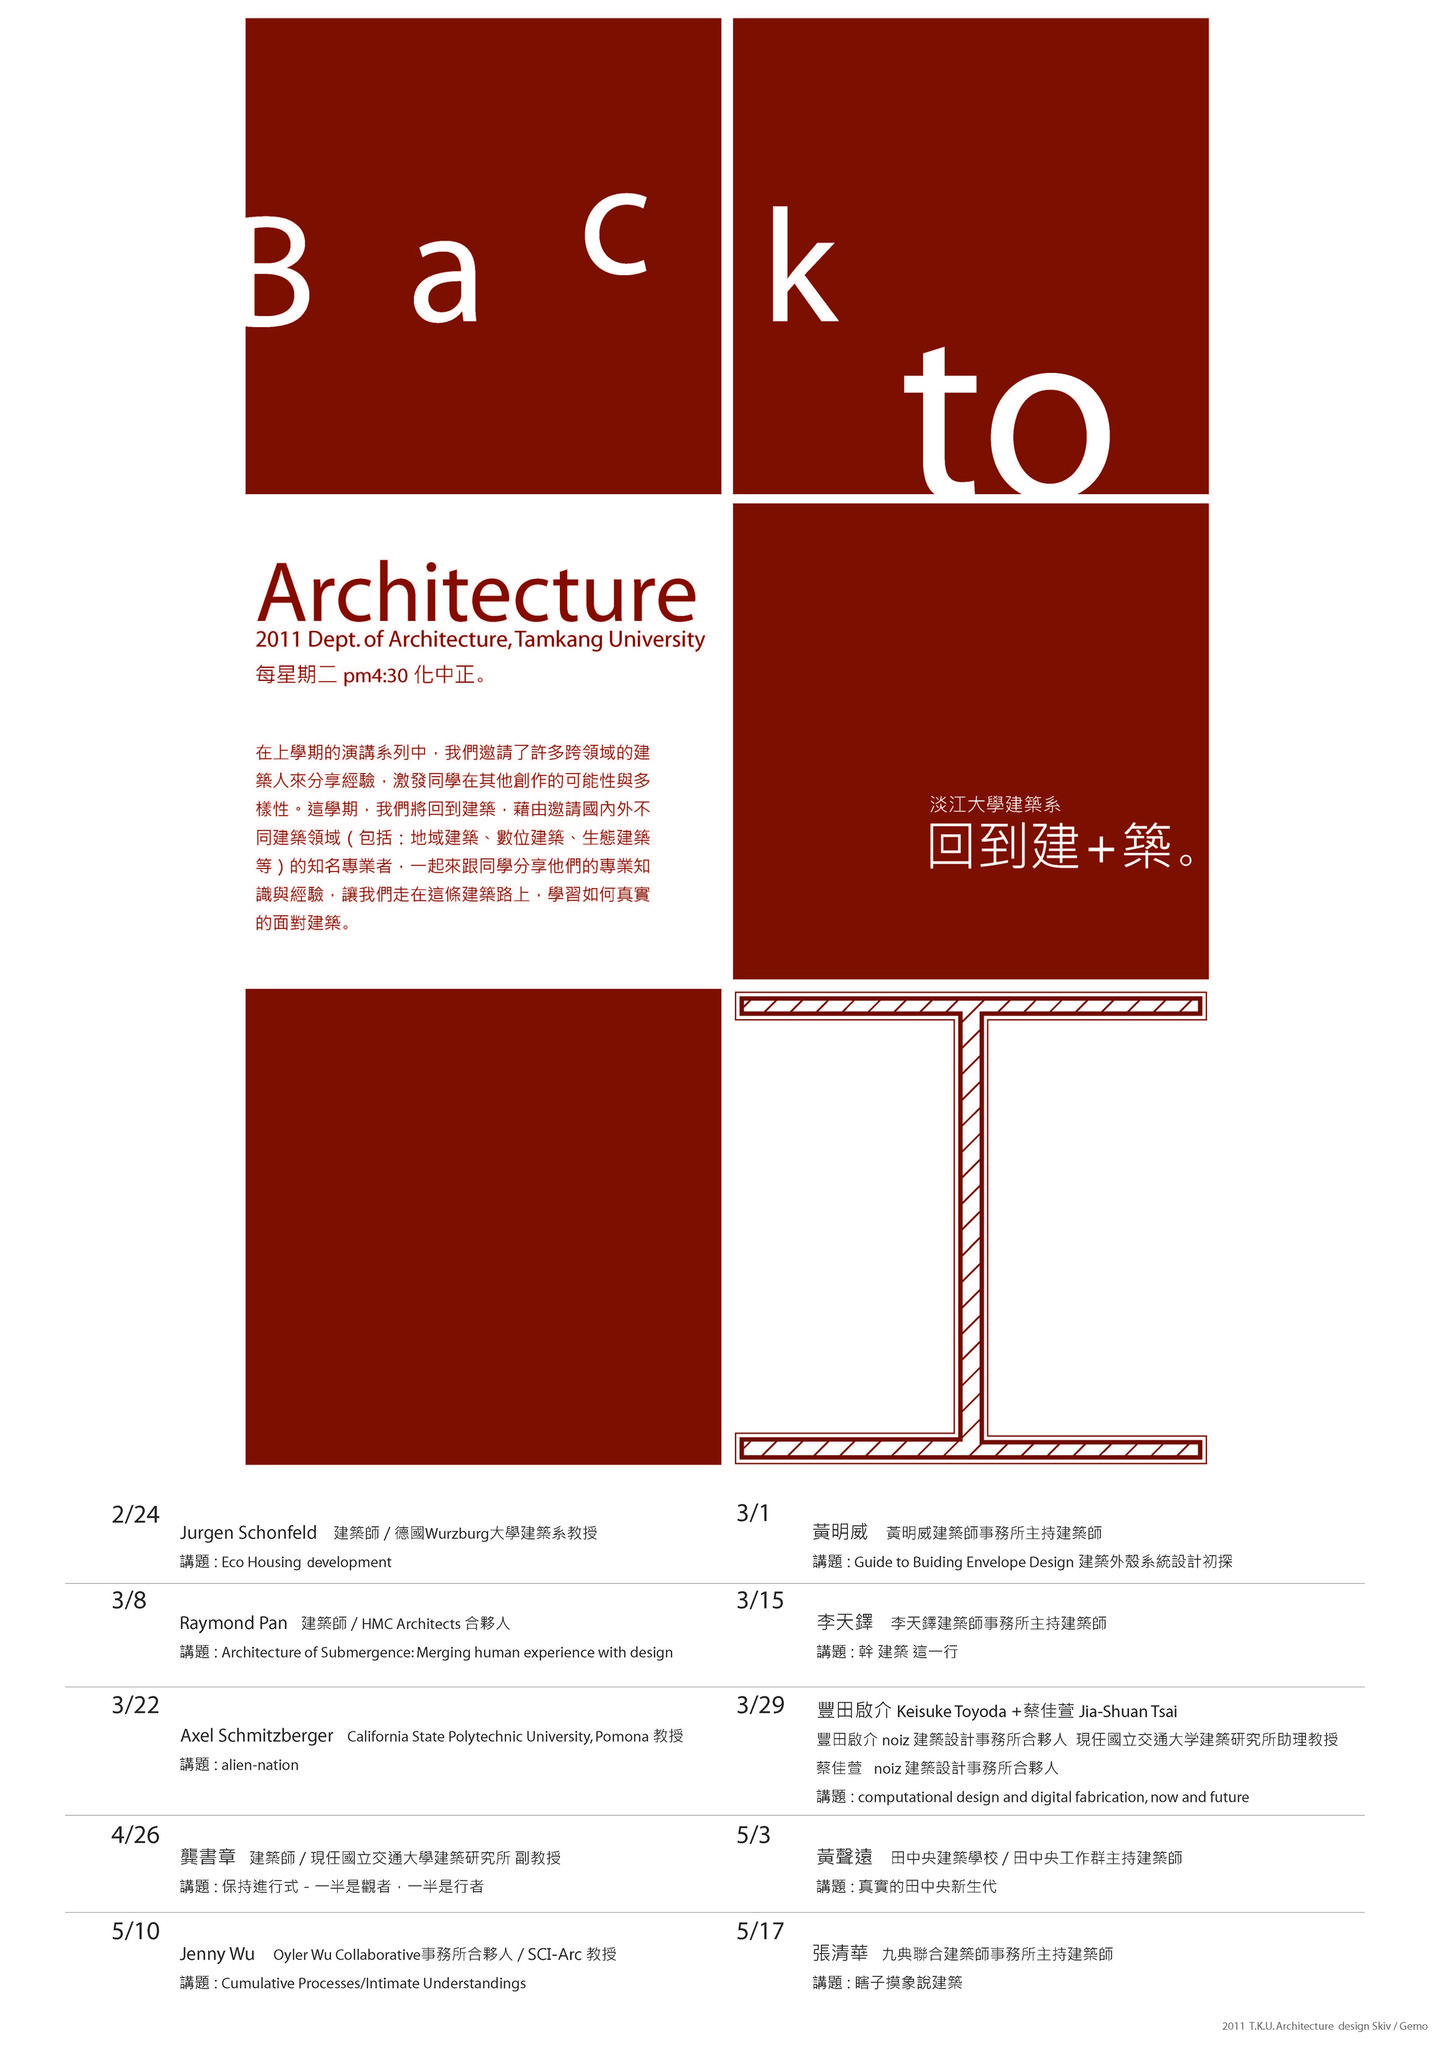 Tamkang University - Lecture, axel